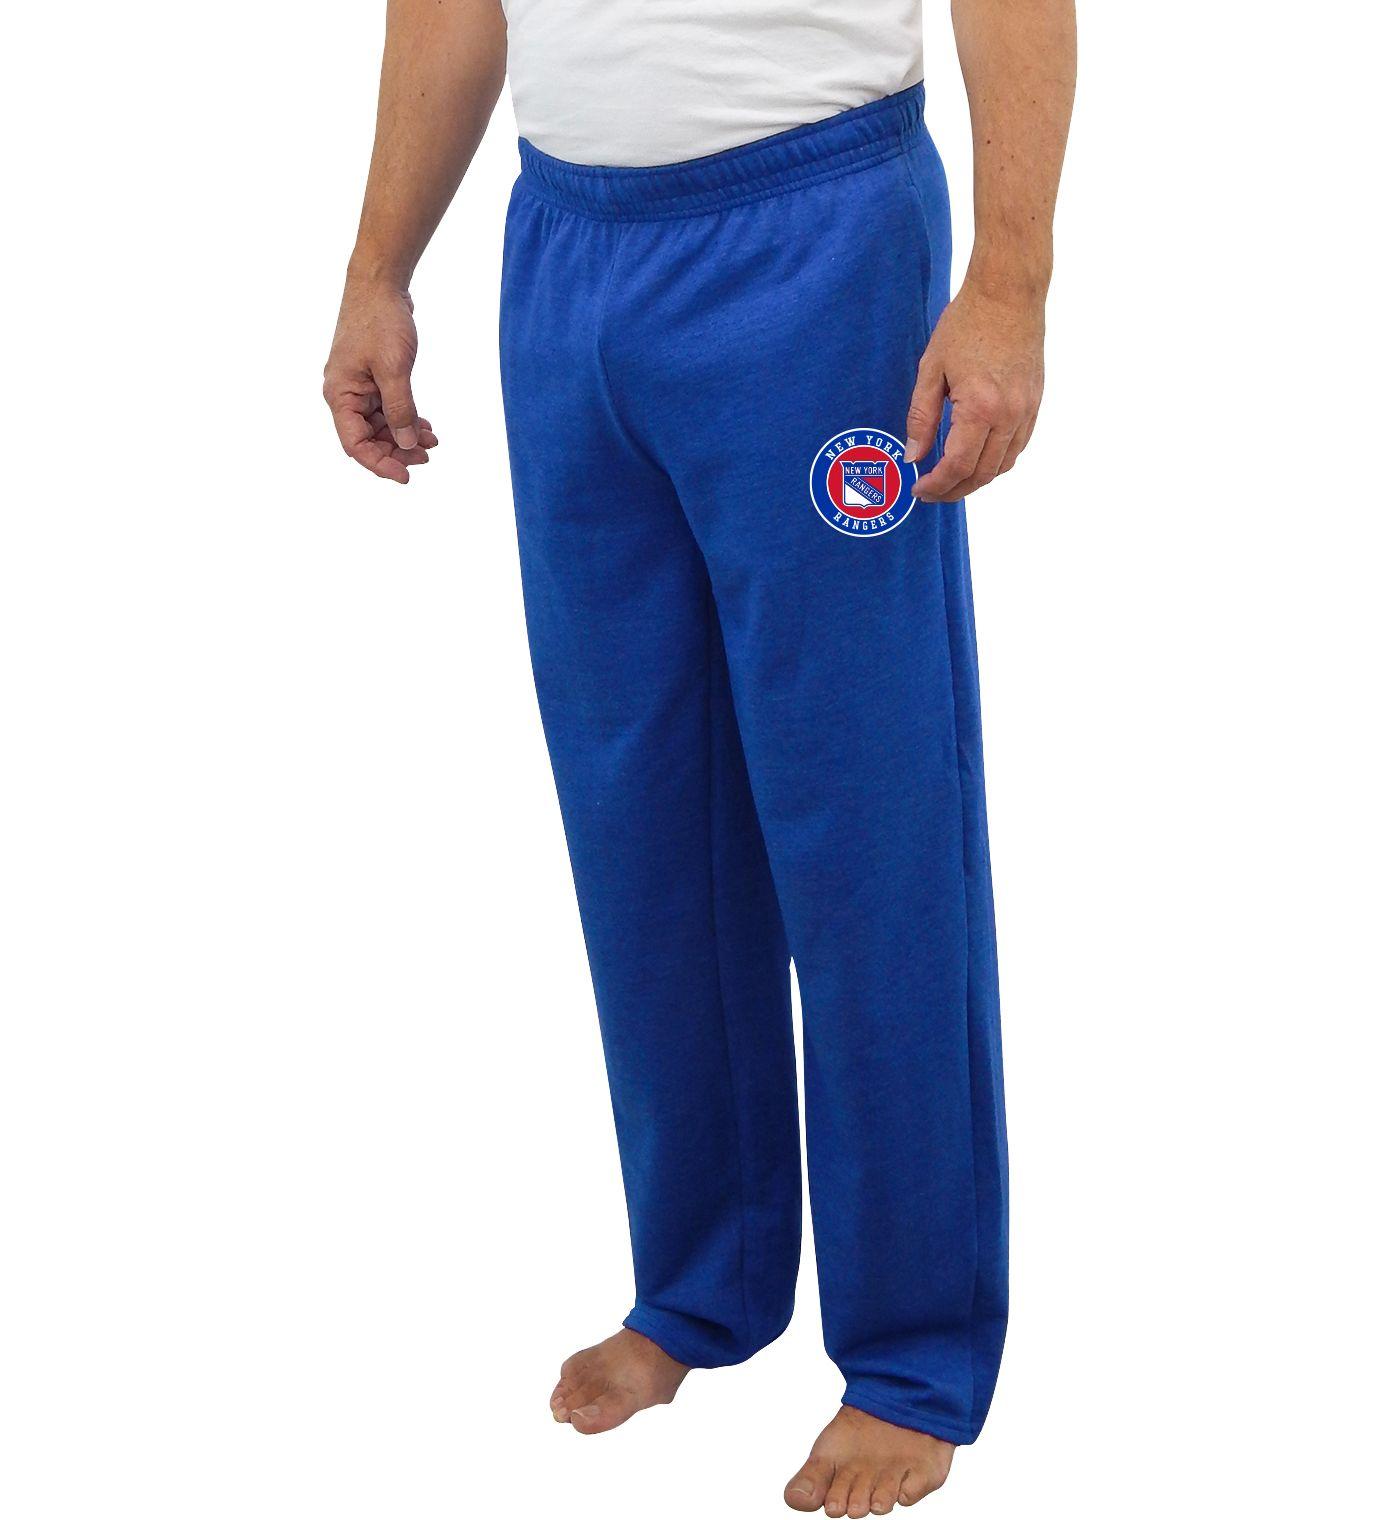 Concepts Sport Men's New York Rangers Mainstream  Joggers